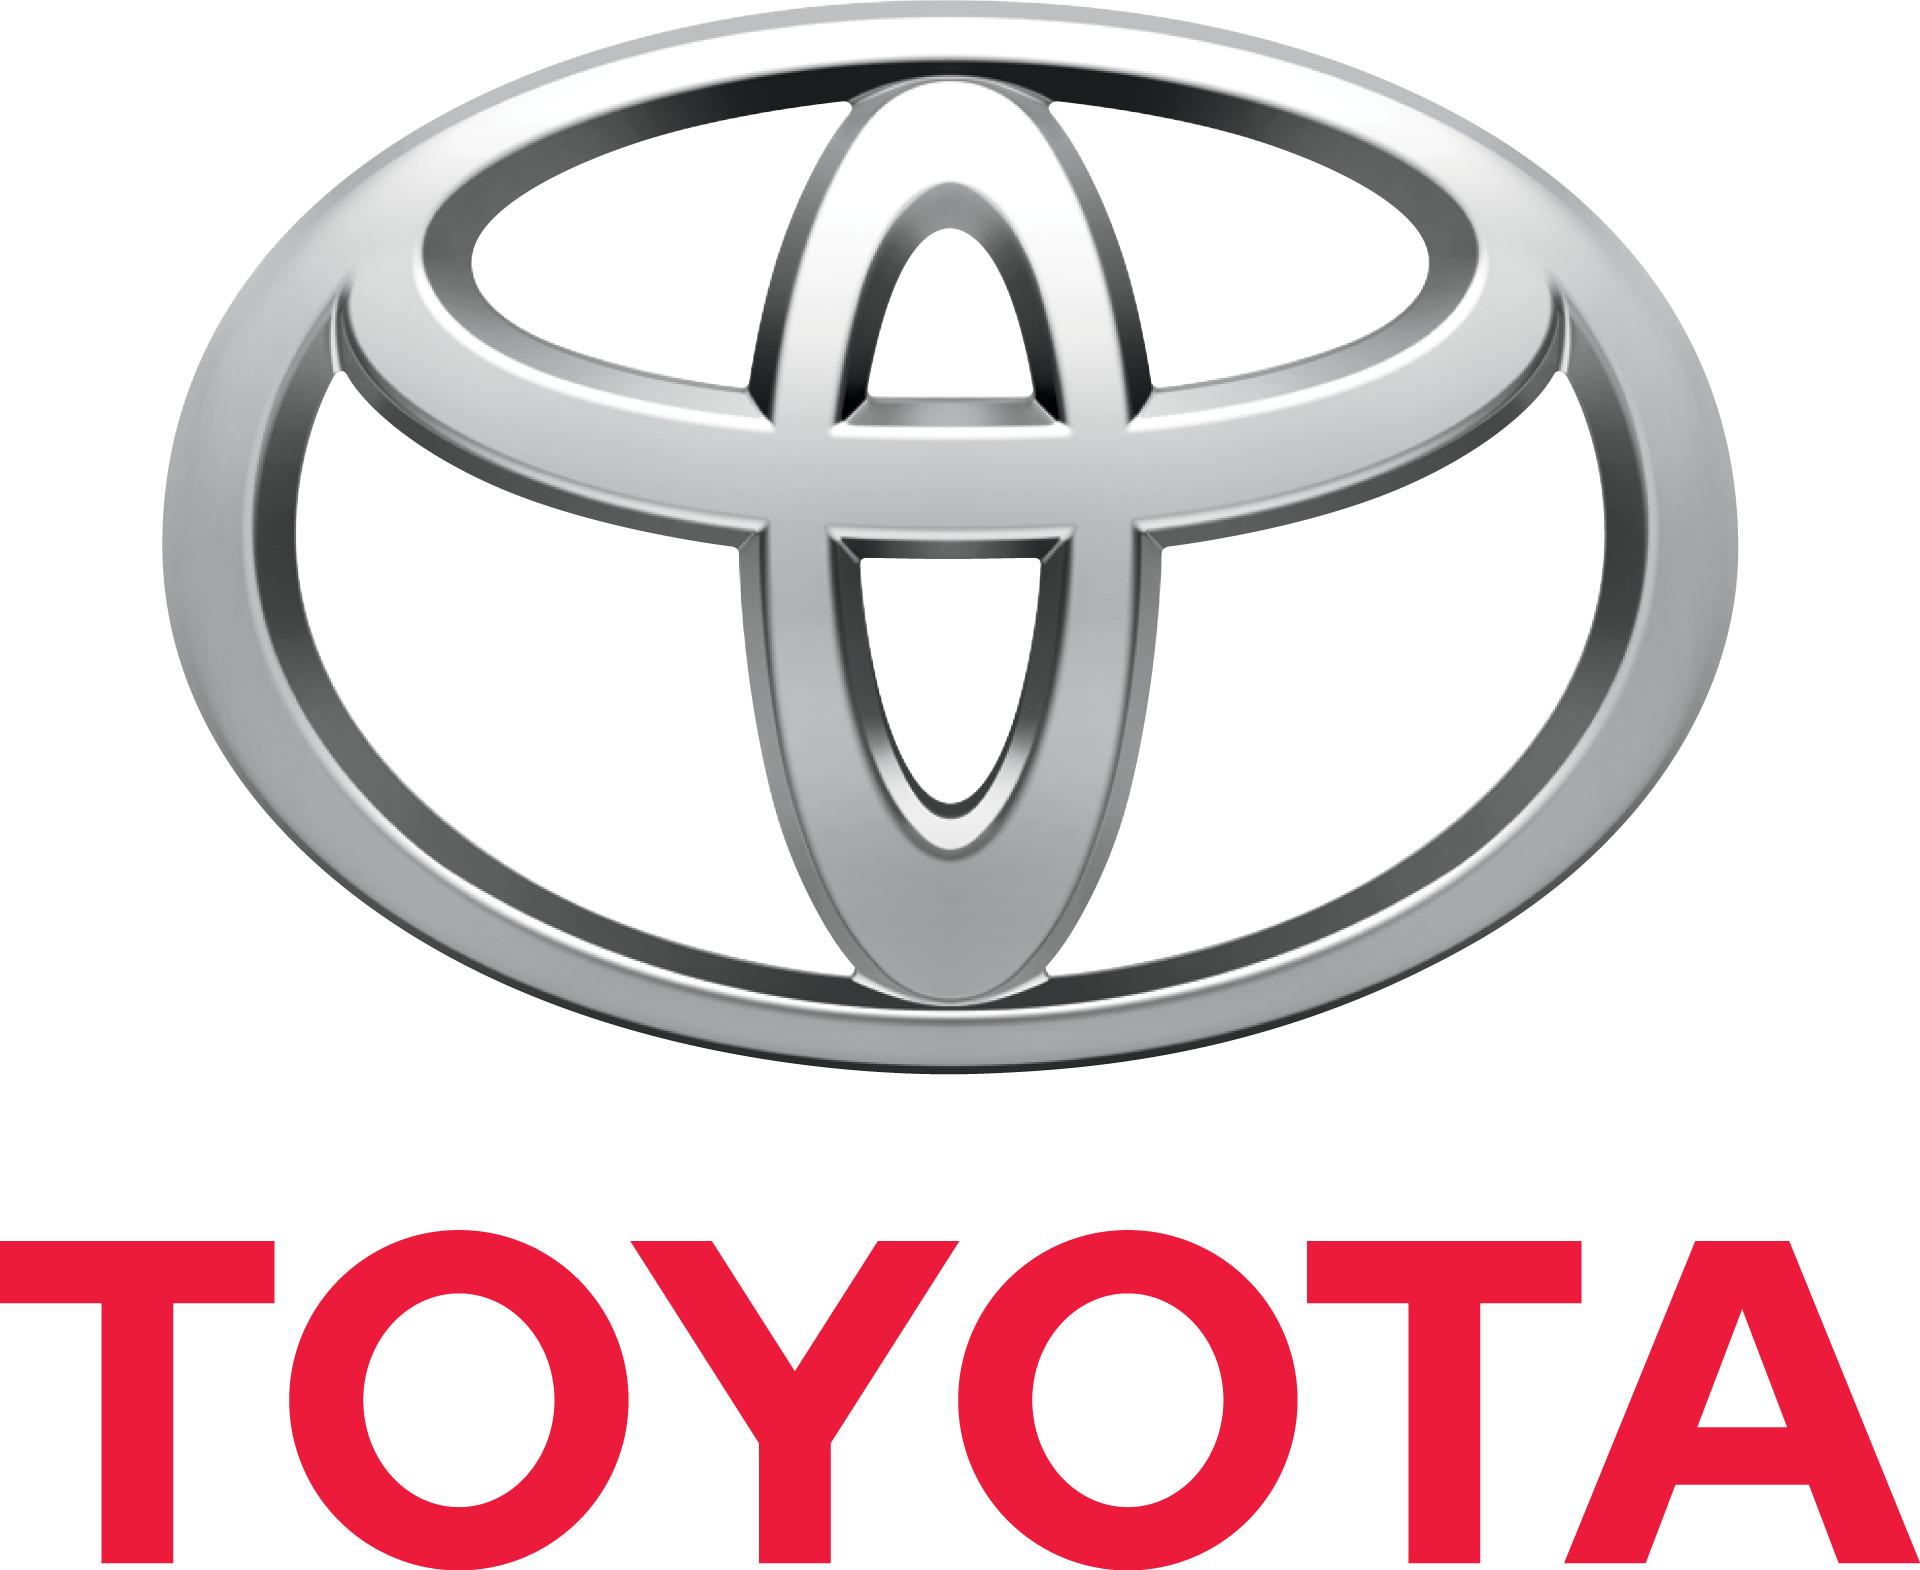 toyota logo hd